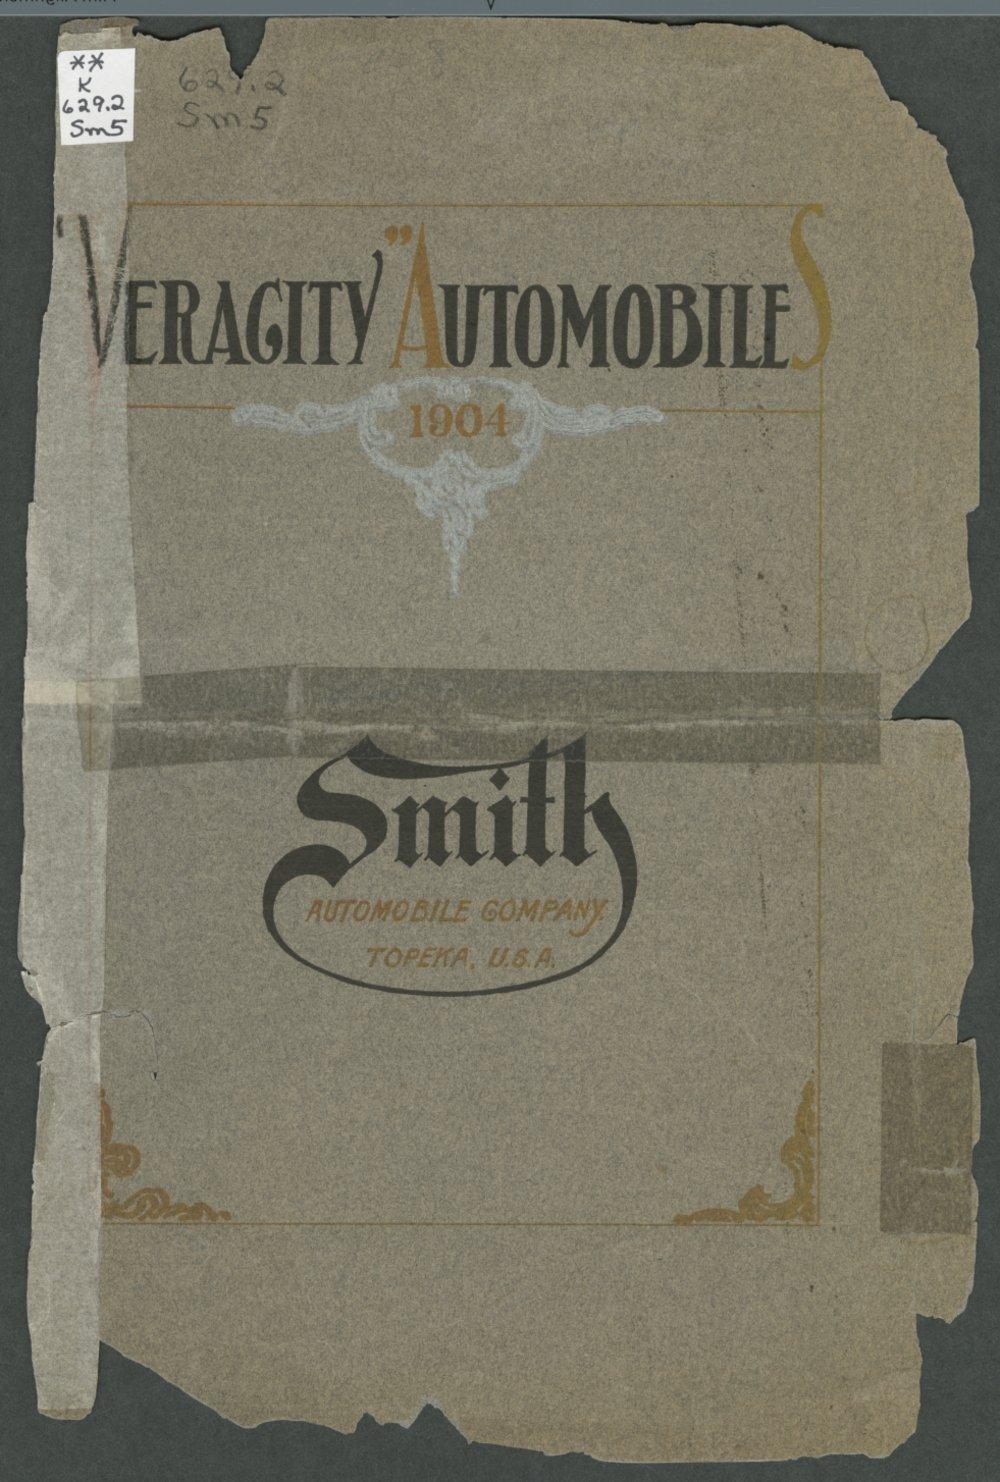 Veracity automobiles. Smith Automobile Company, Topeka, Kansas - Front Cover